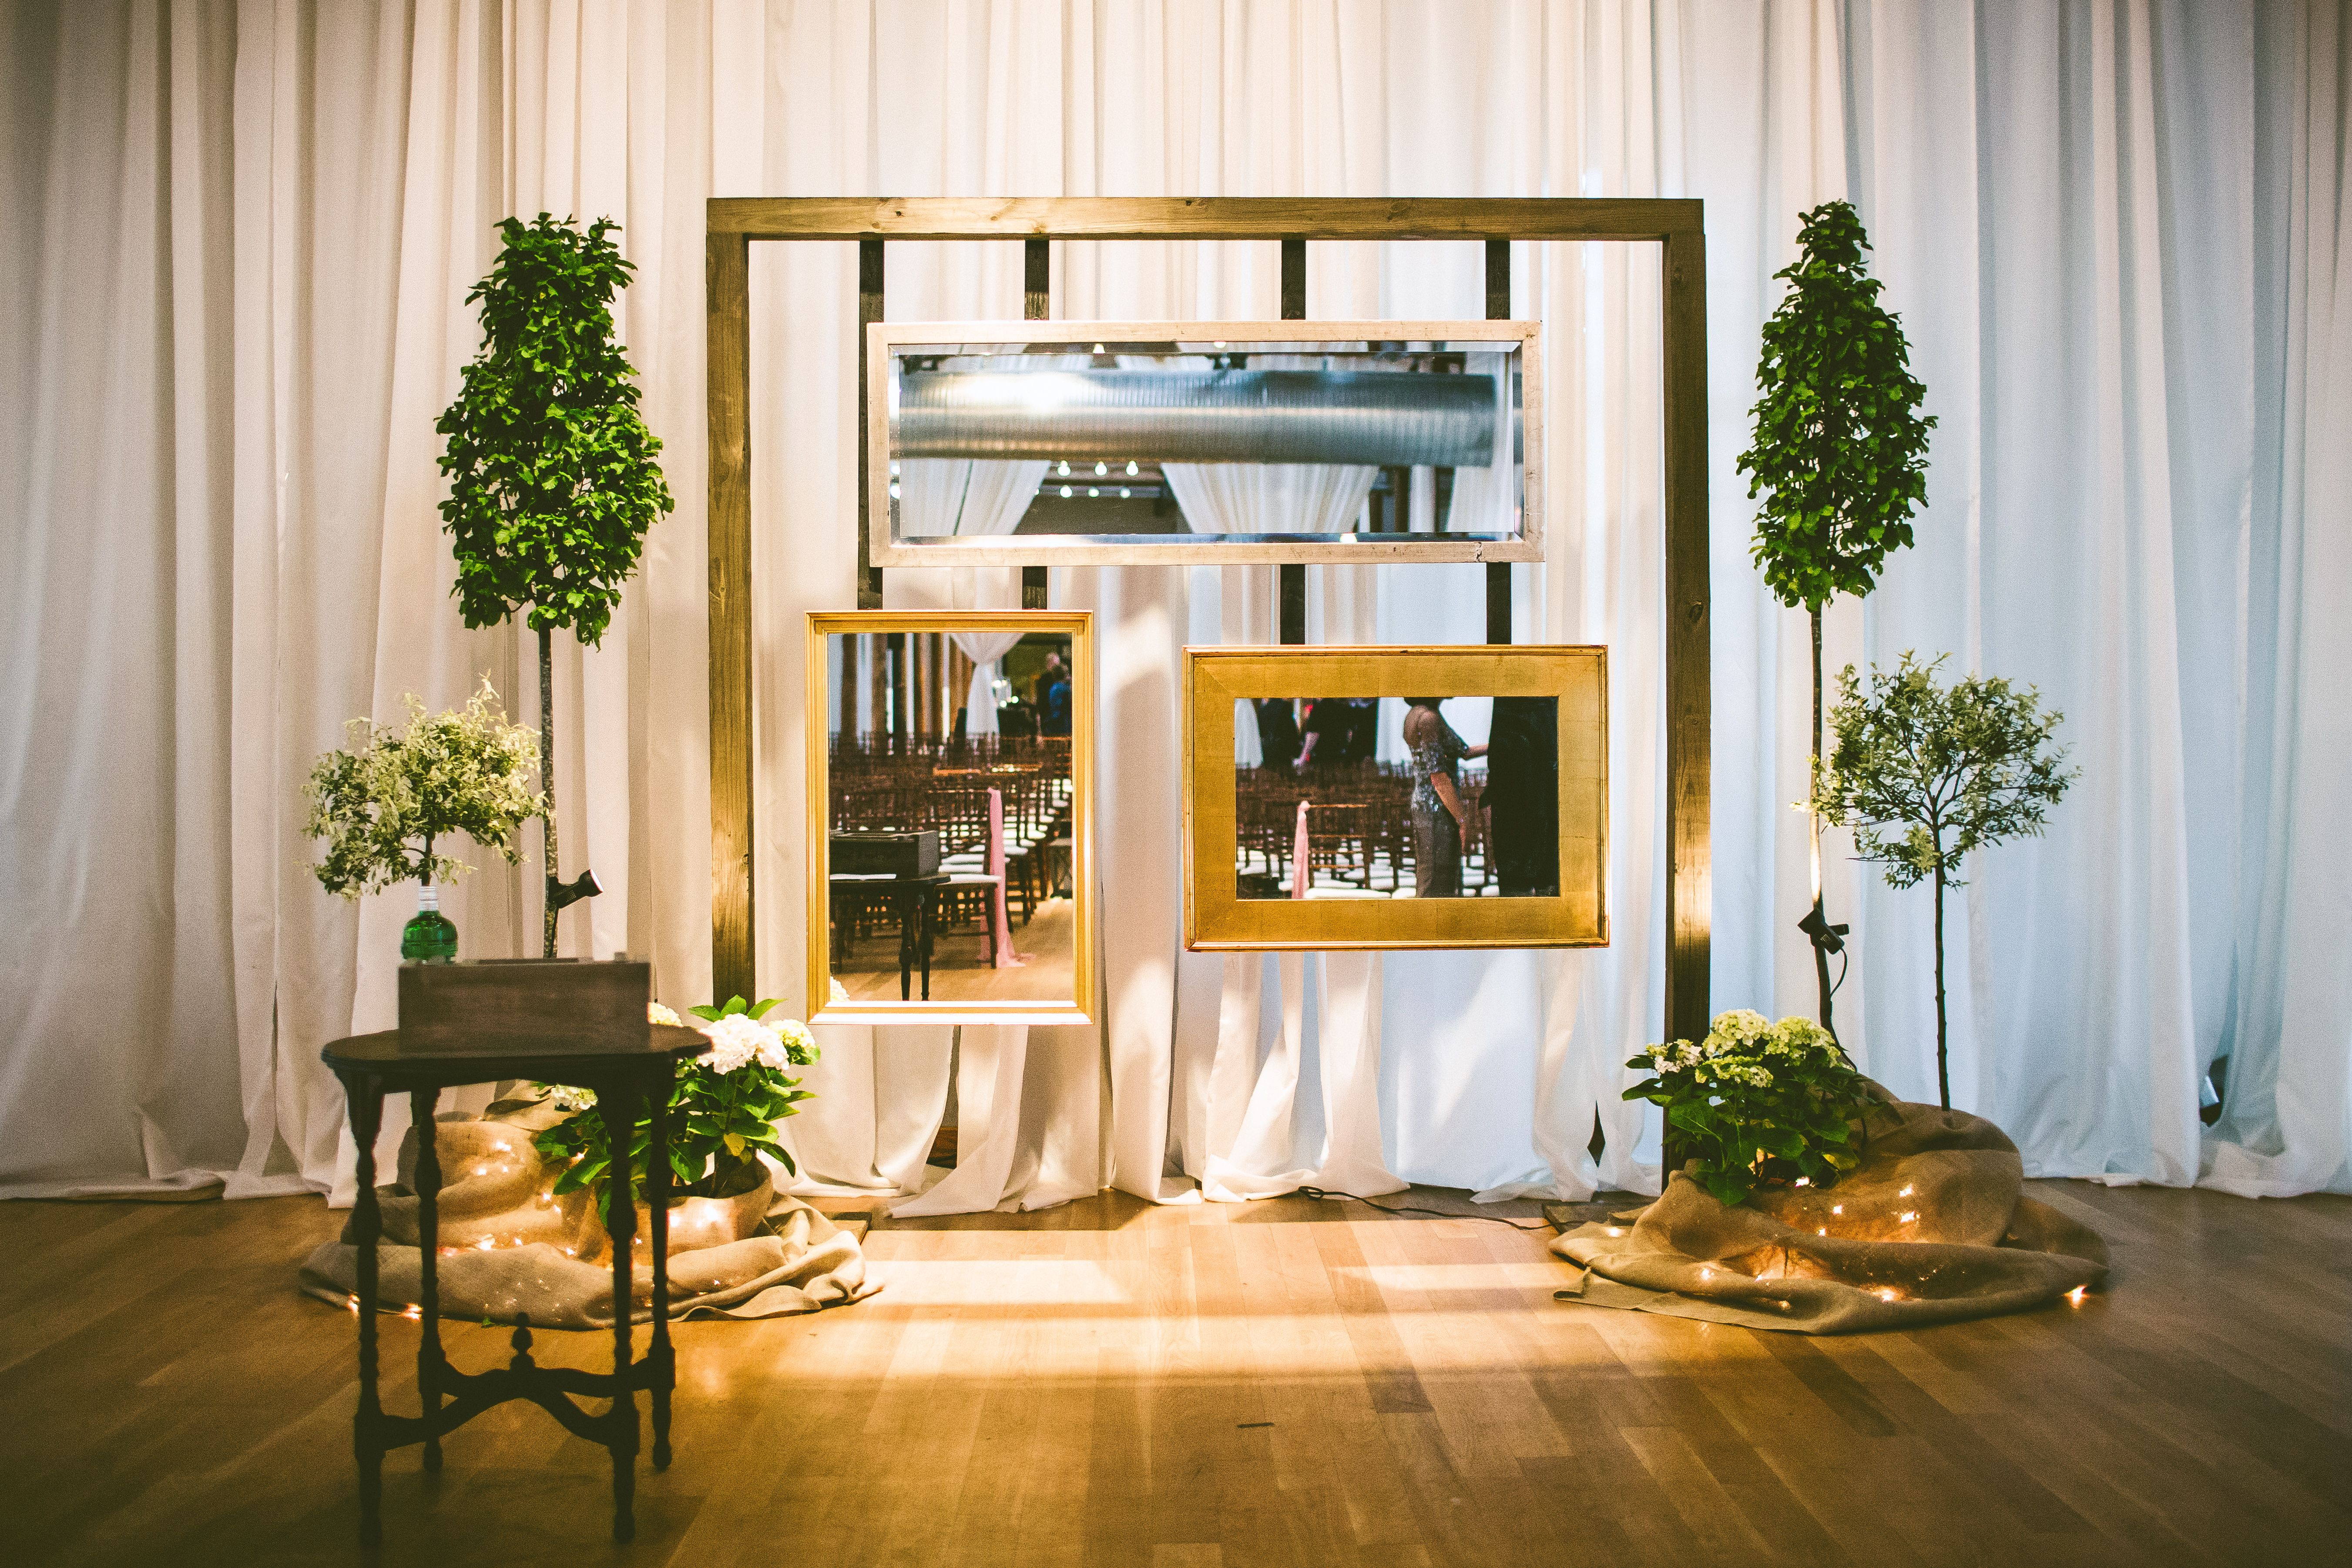 Diy framed mirror wedding alter decor photobooth idea pinterest